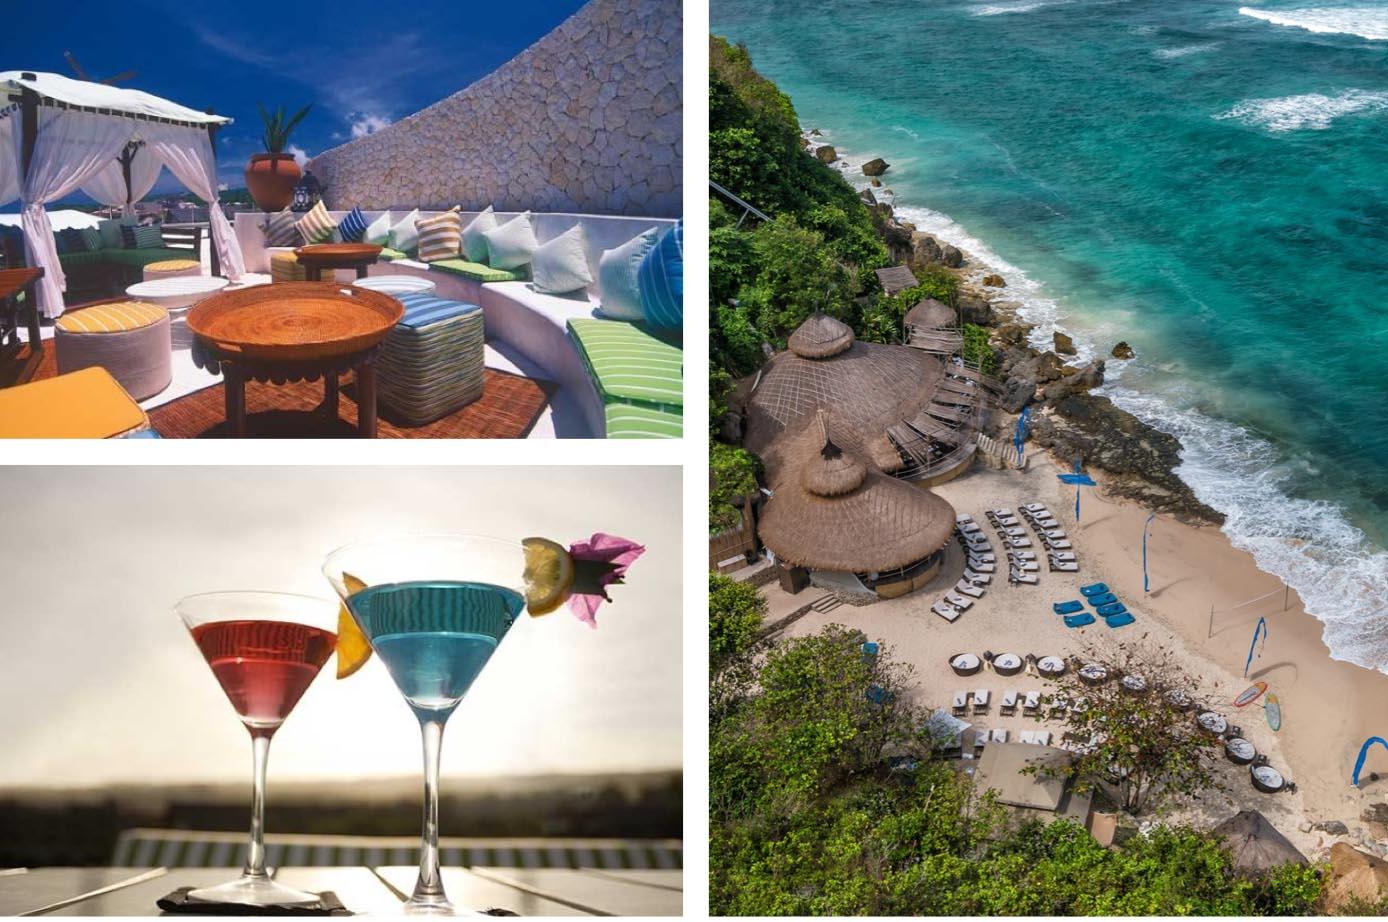 Temple-Bar-and-Lounge-Karma-Kandara-Bali